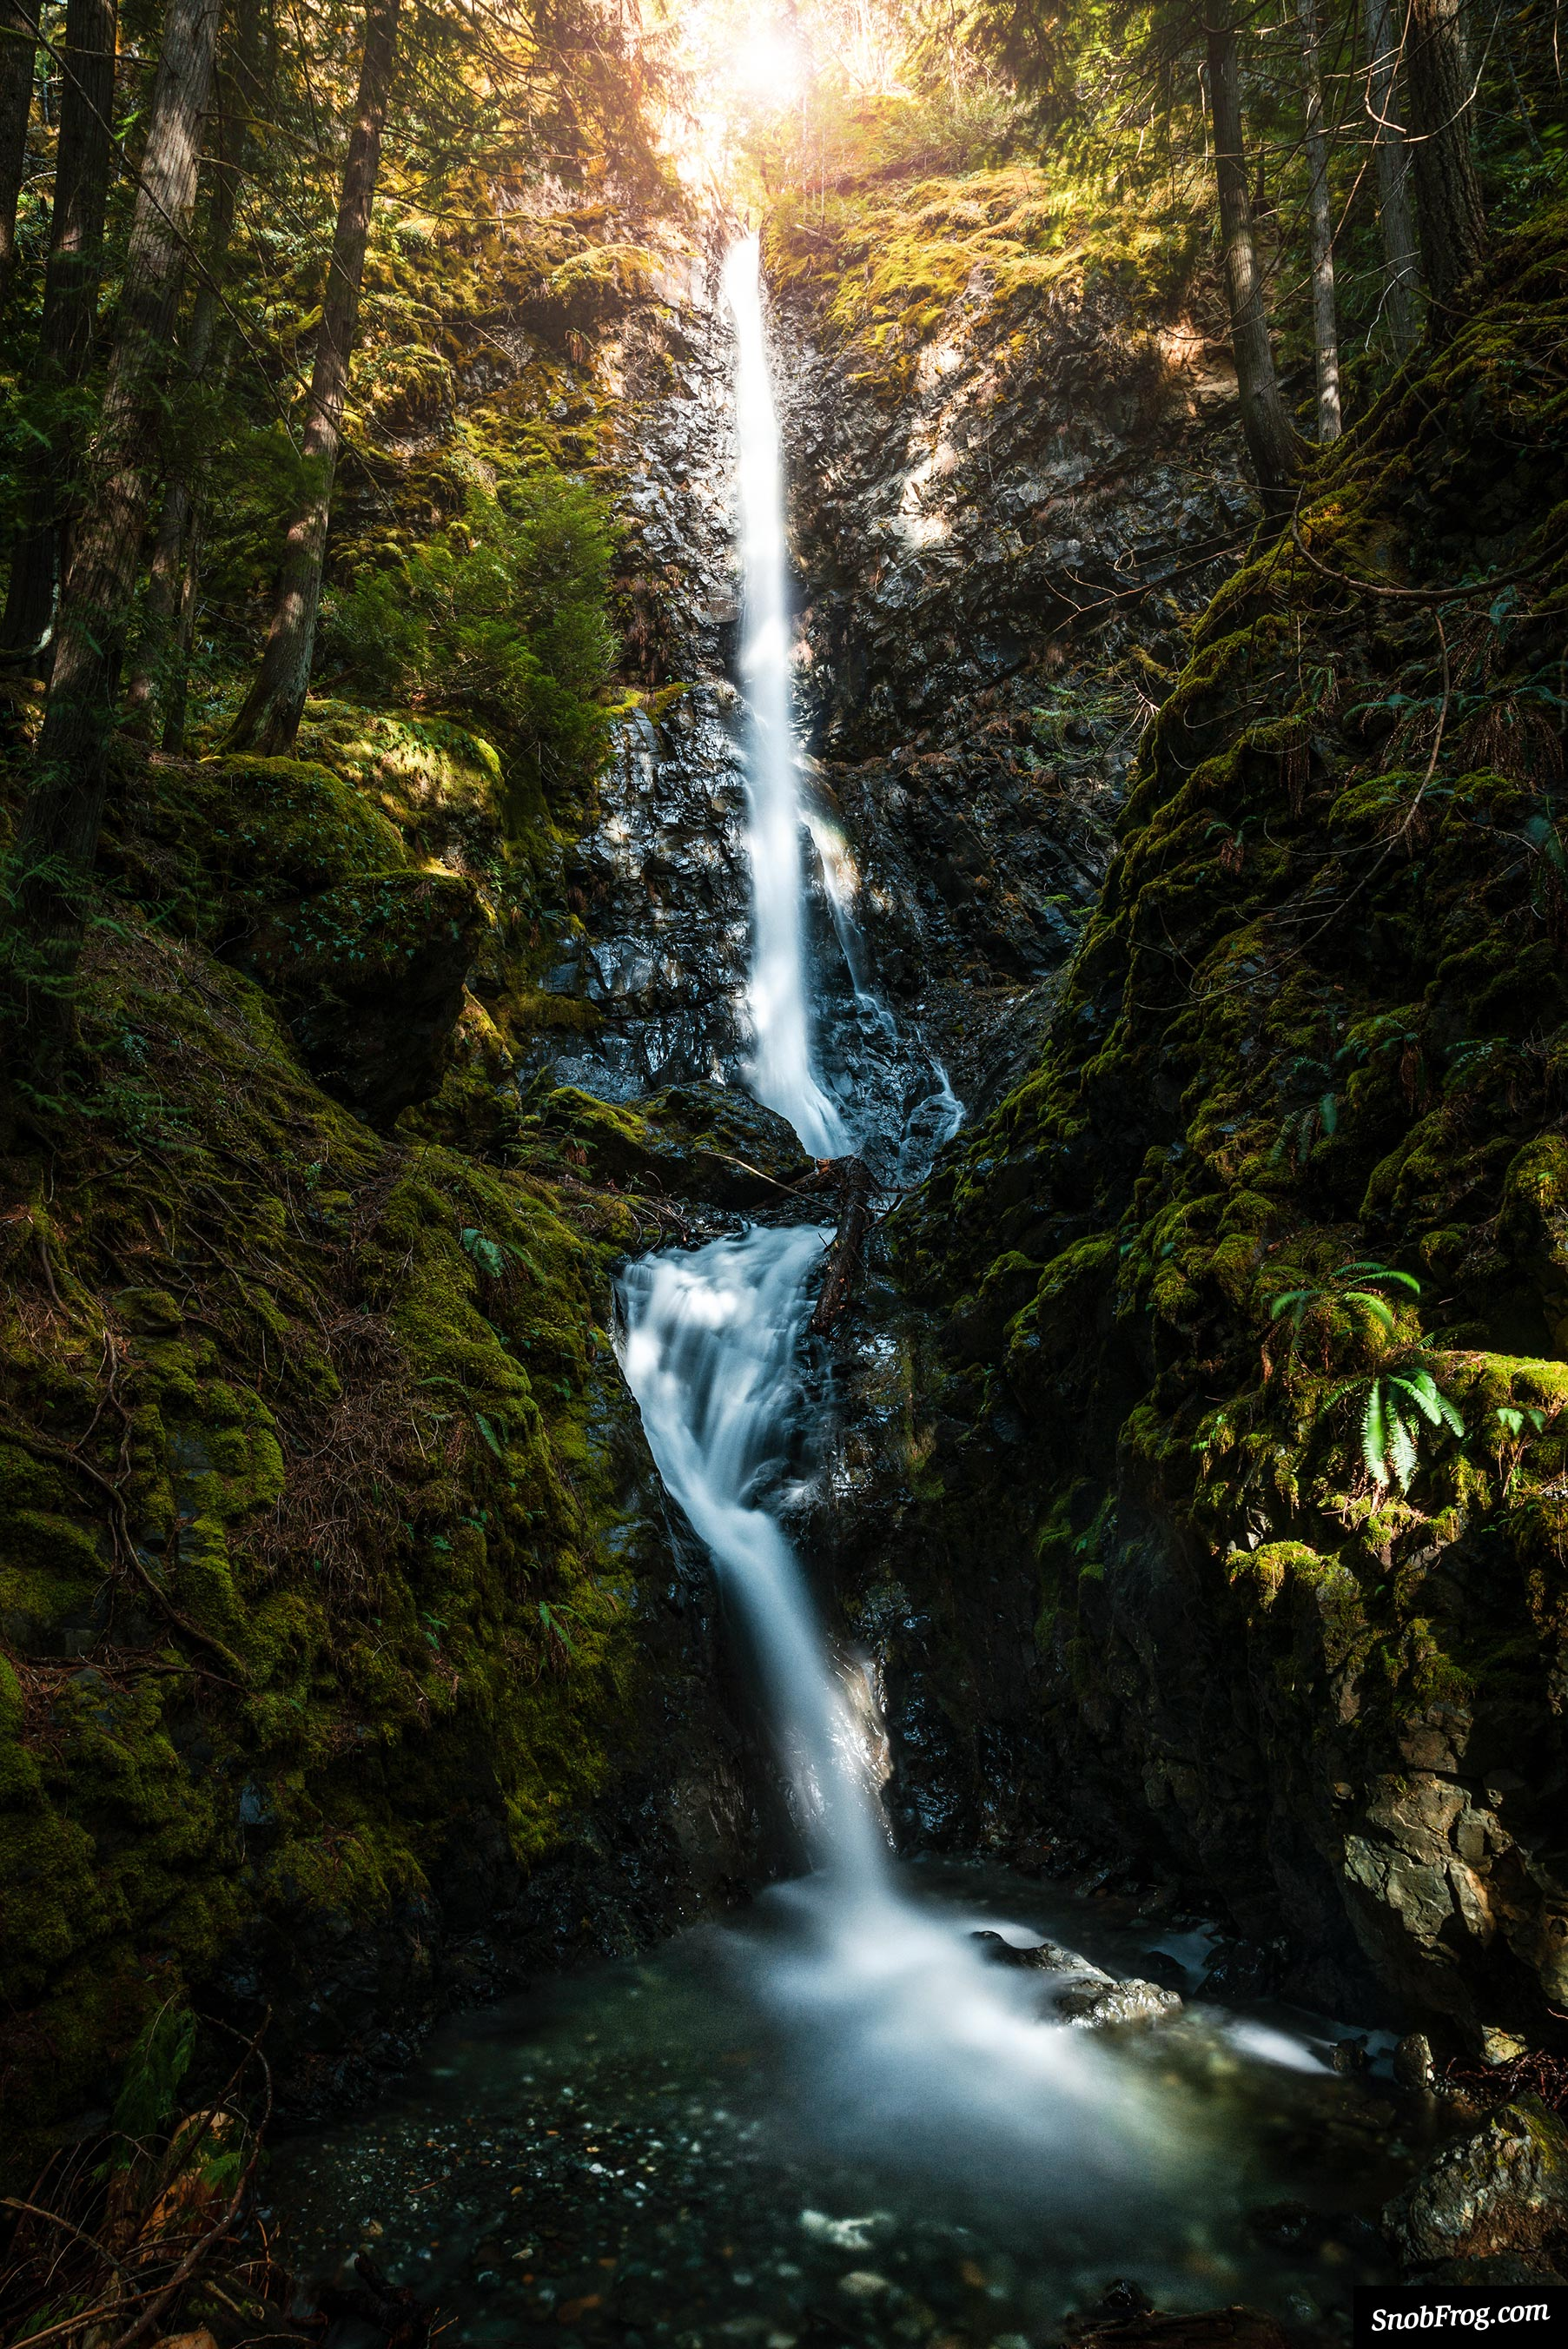 DSC_4127_lupin_falls_strathcona_provincial_park